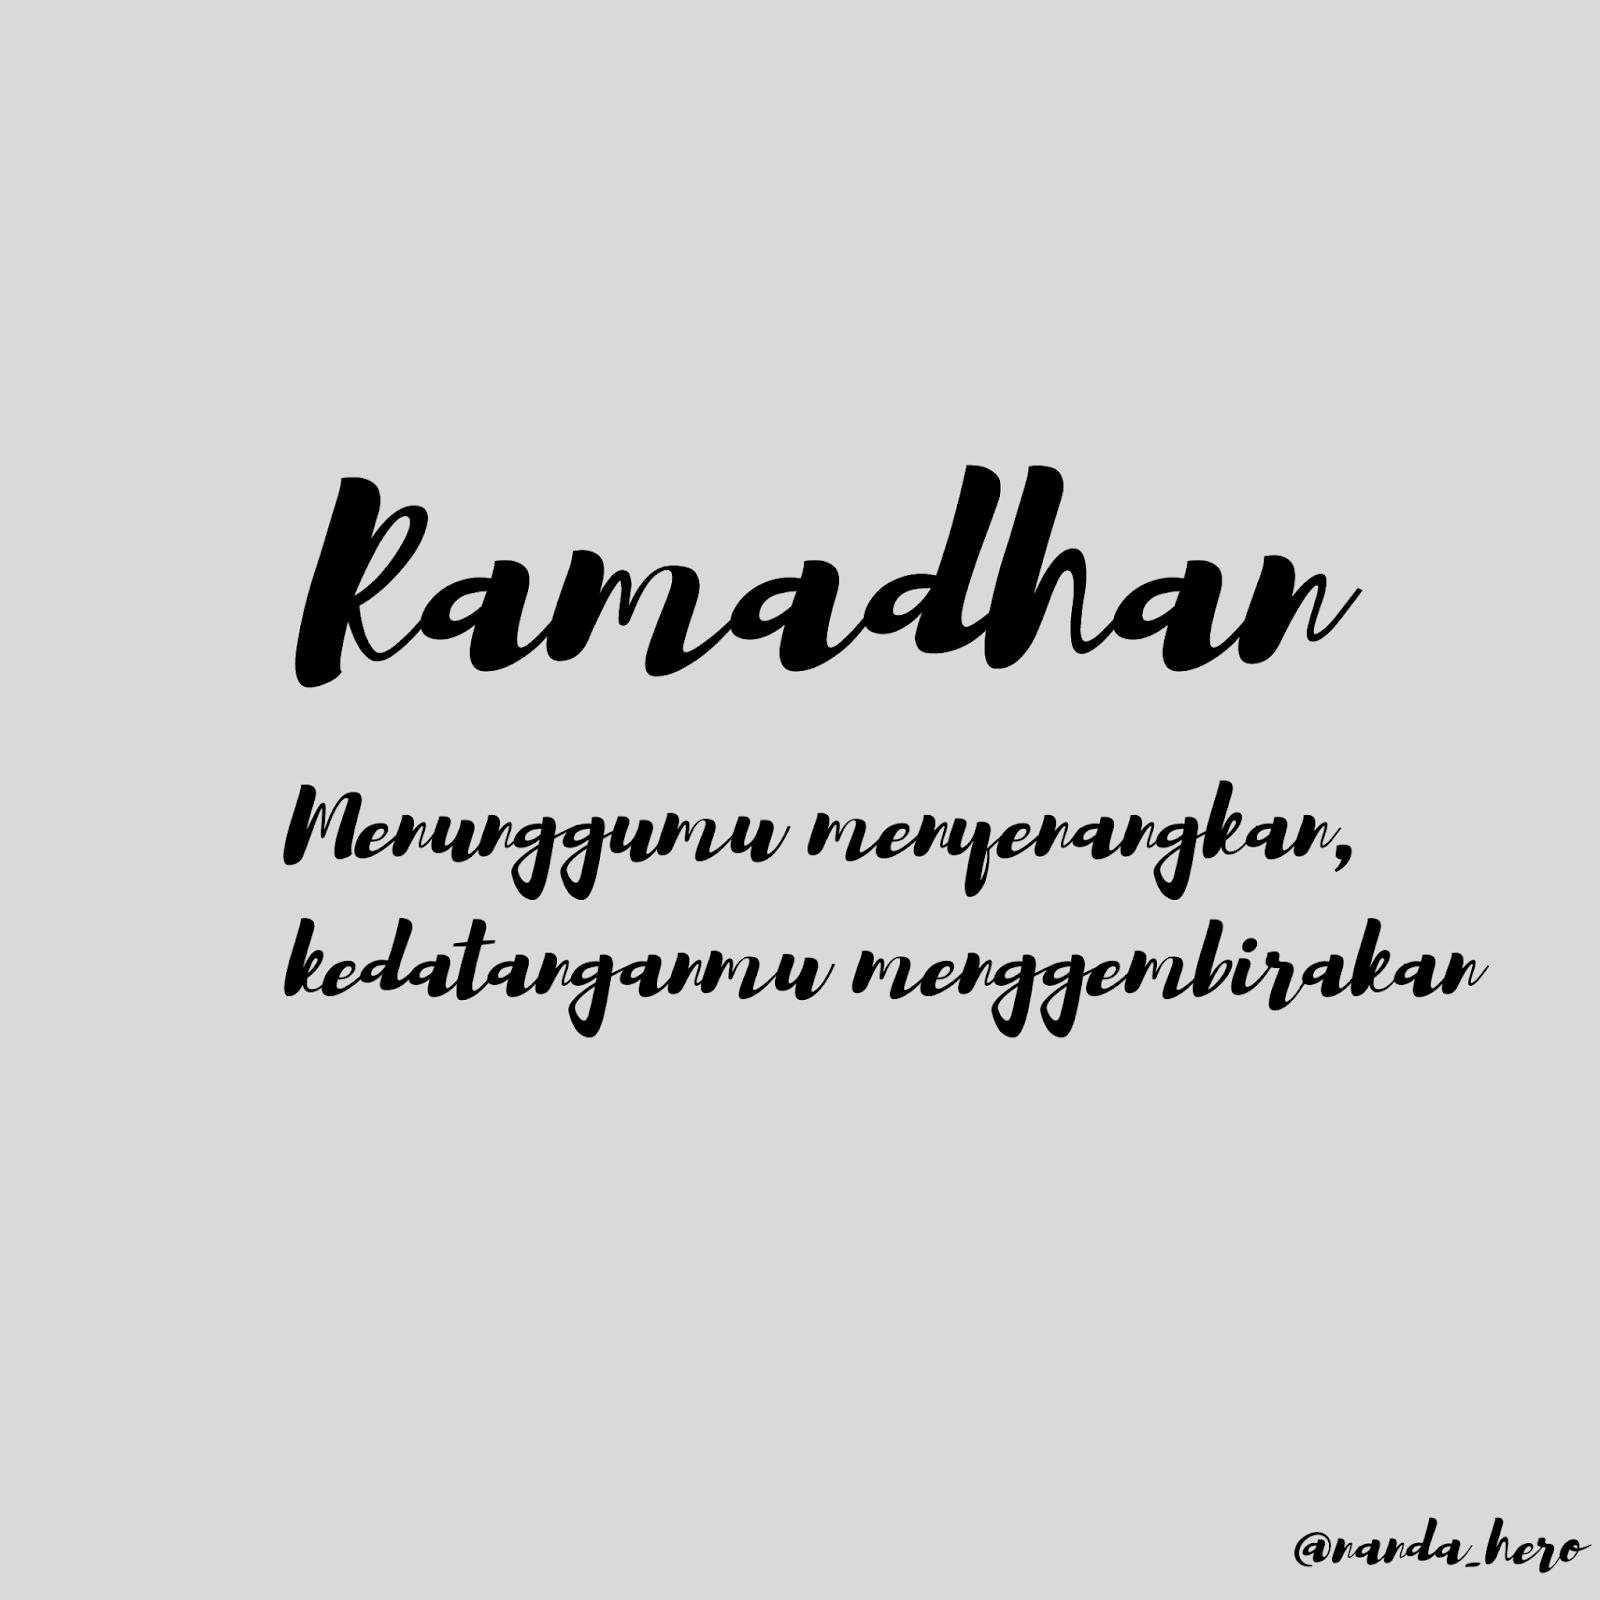 kata-kata menyambut ramadhan 2018 2019